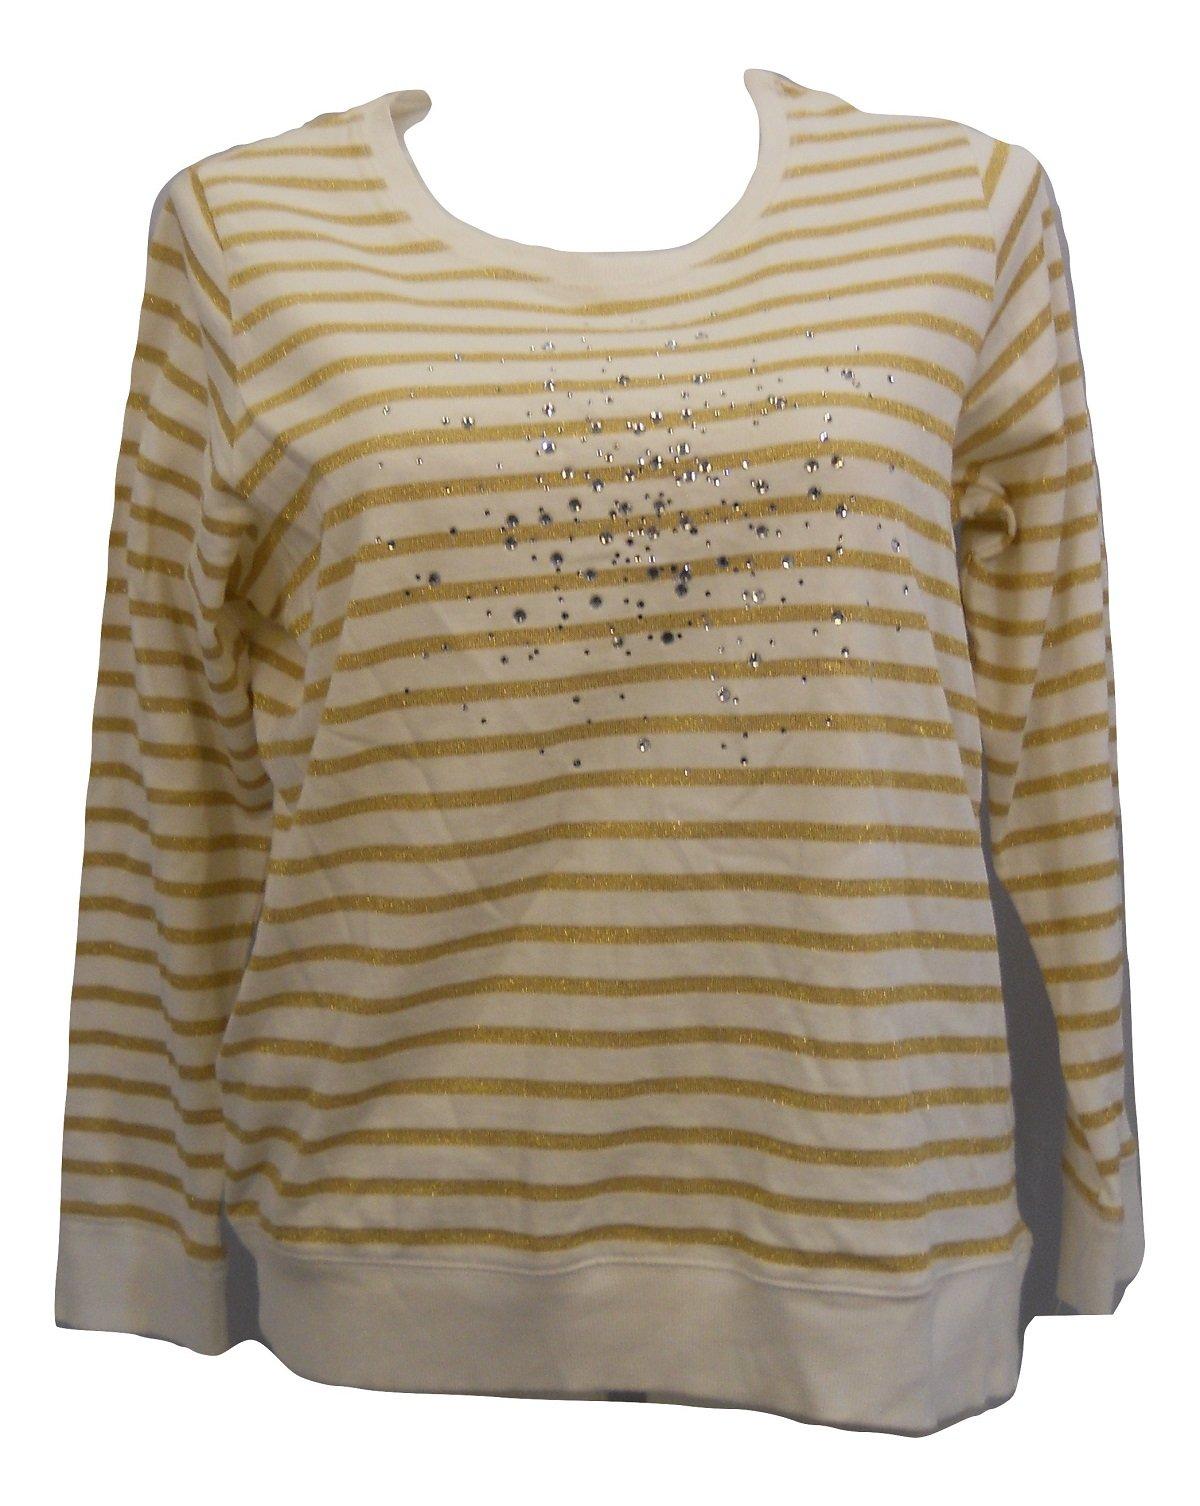 Style & Co. Womens Sweatshirt Plus Size 0X Jeweled White Gold Striped Long Sleeve